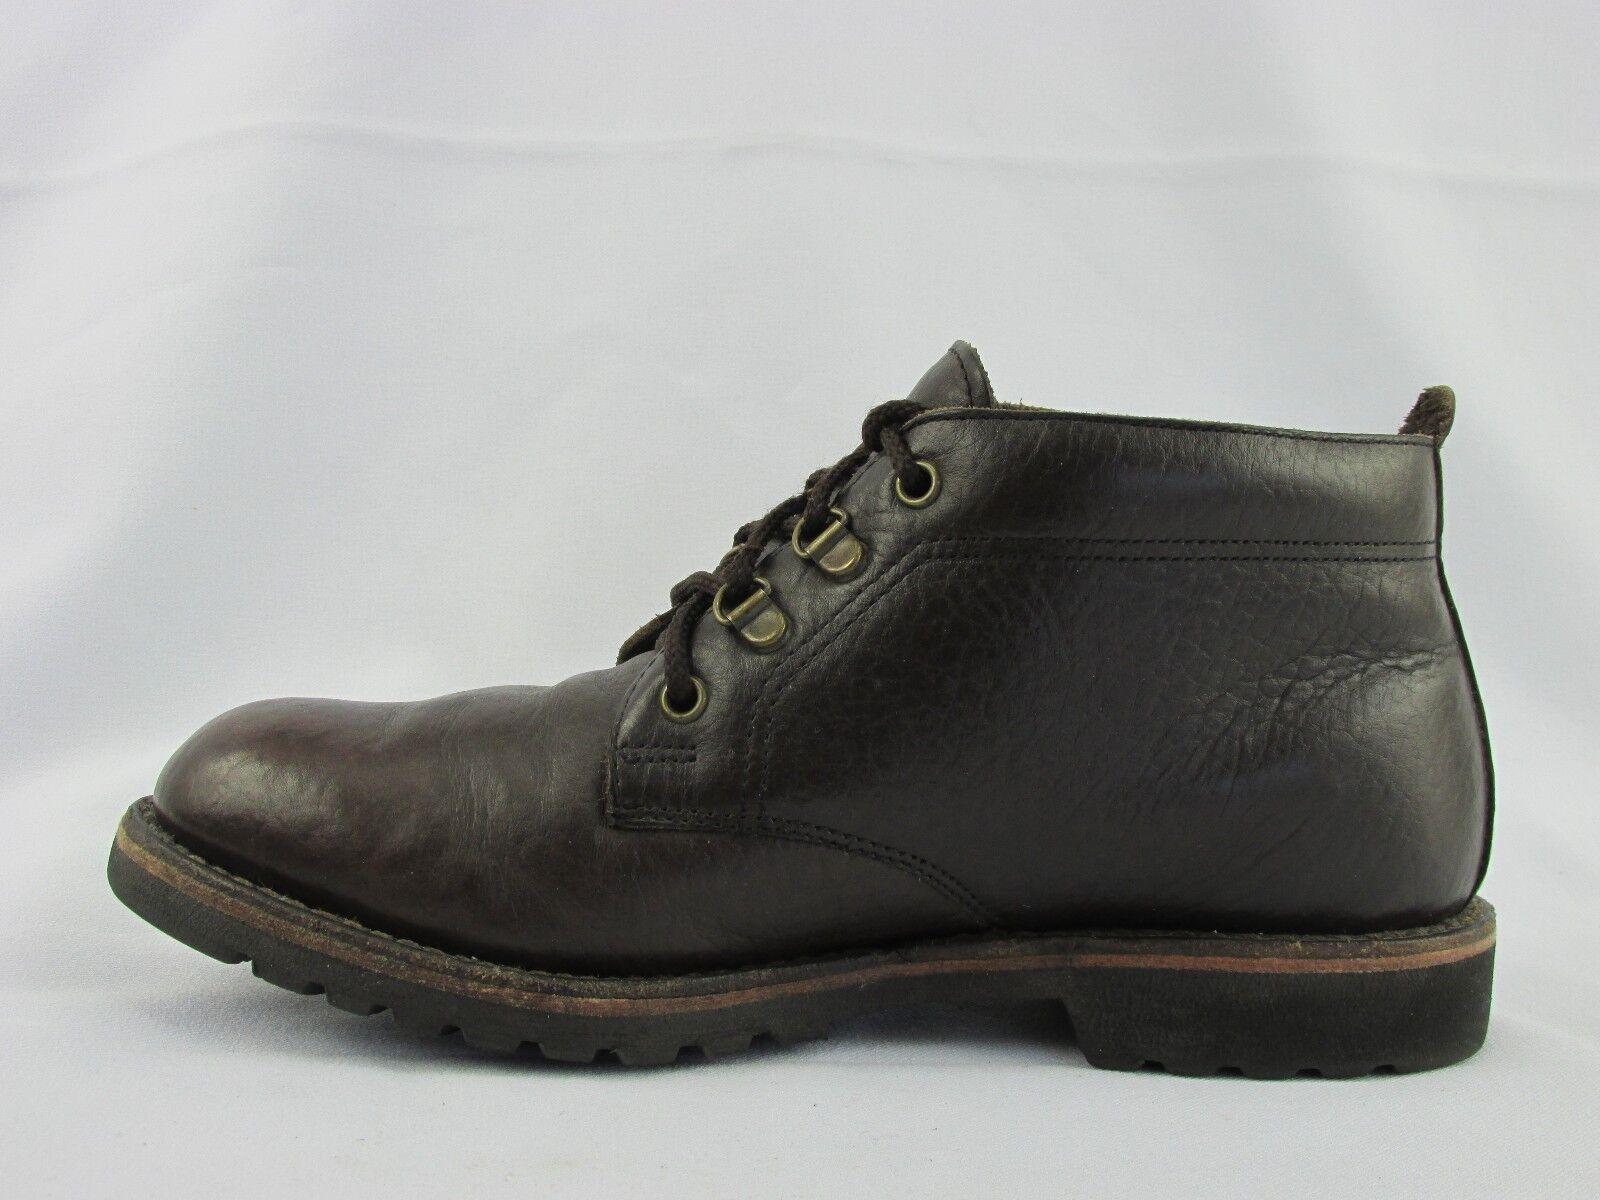 e8660d02e95 ... H.S.Trask Vintage Chukka Brown Butter Butter Butter Soft Lined Leather  USA Men s 8.5M bdf037 ...